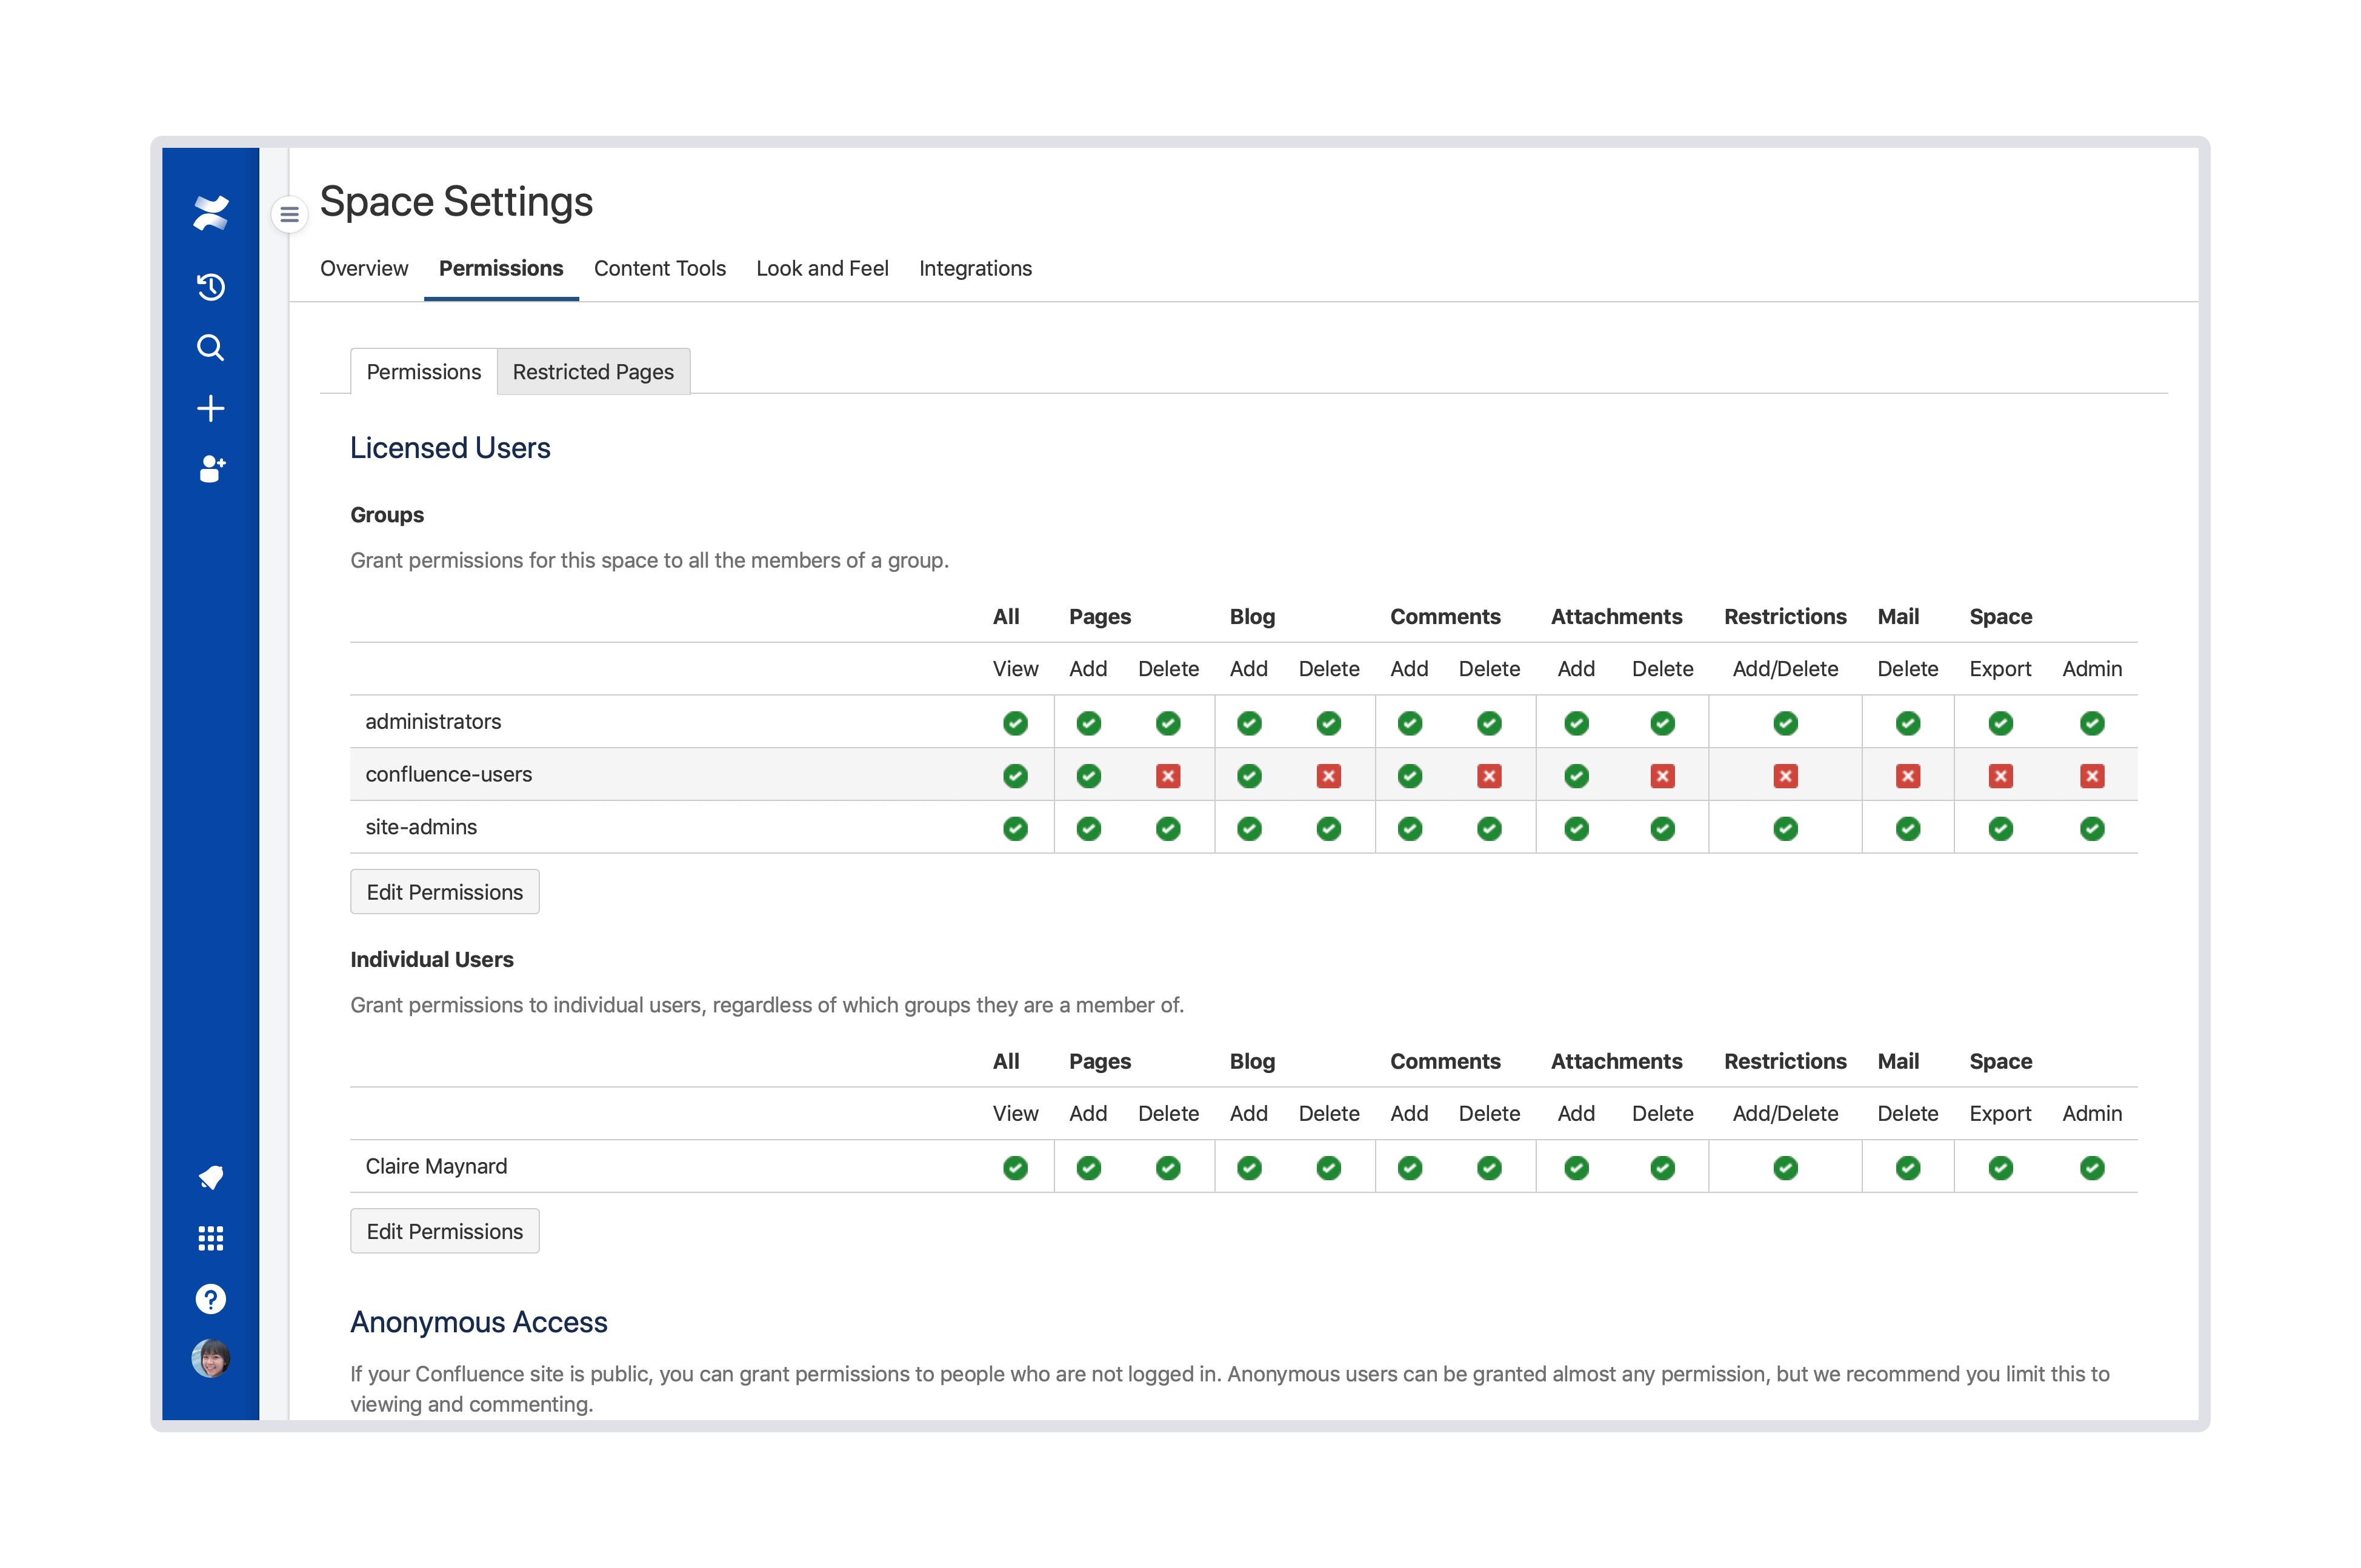 Снимок экрана: права доступа к разделам и страницам